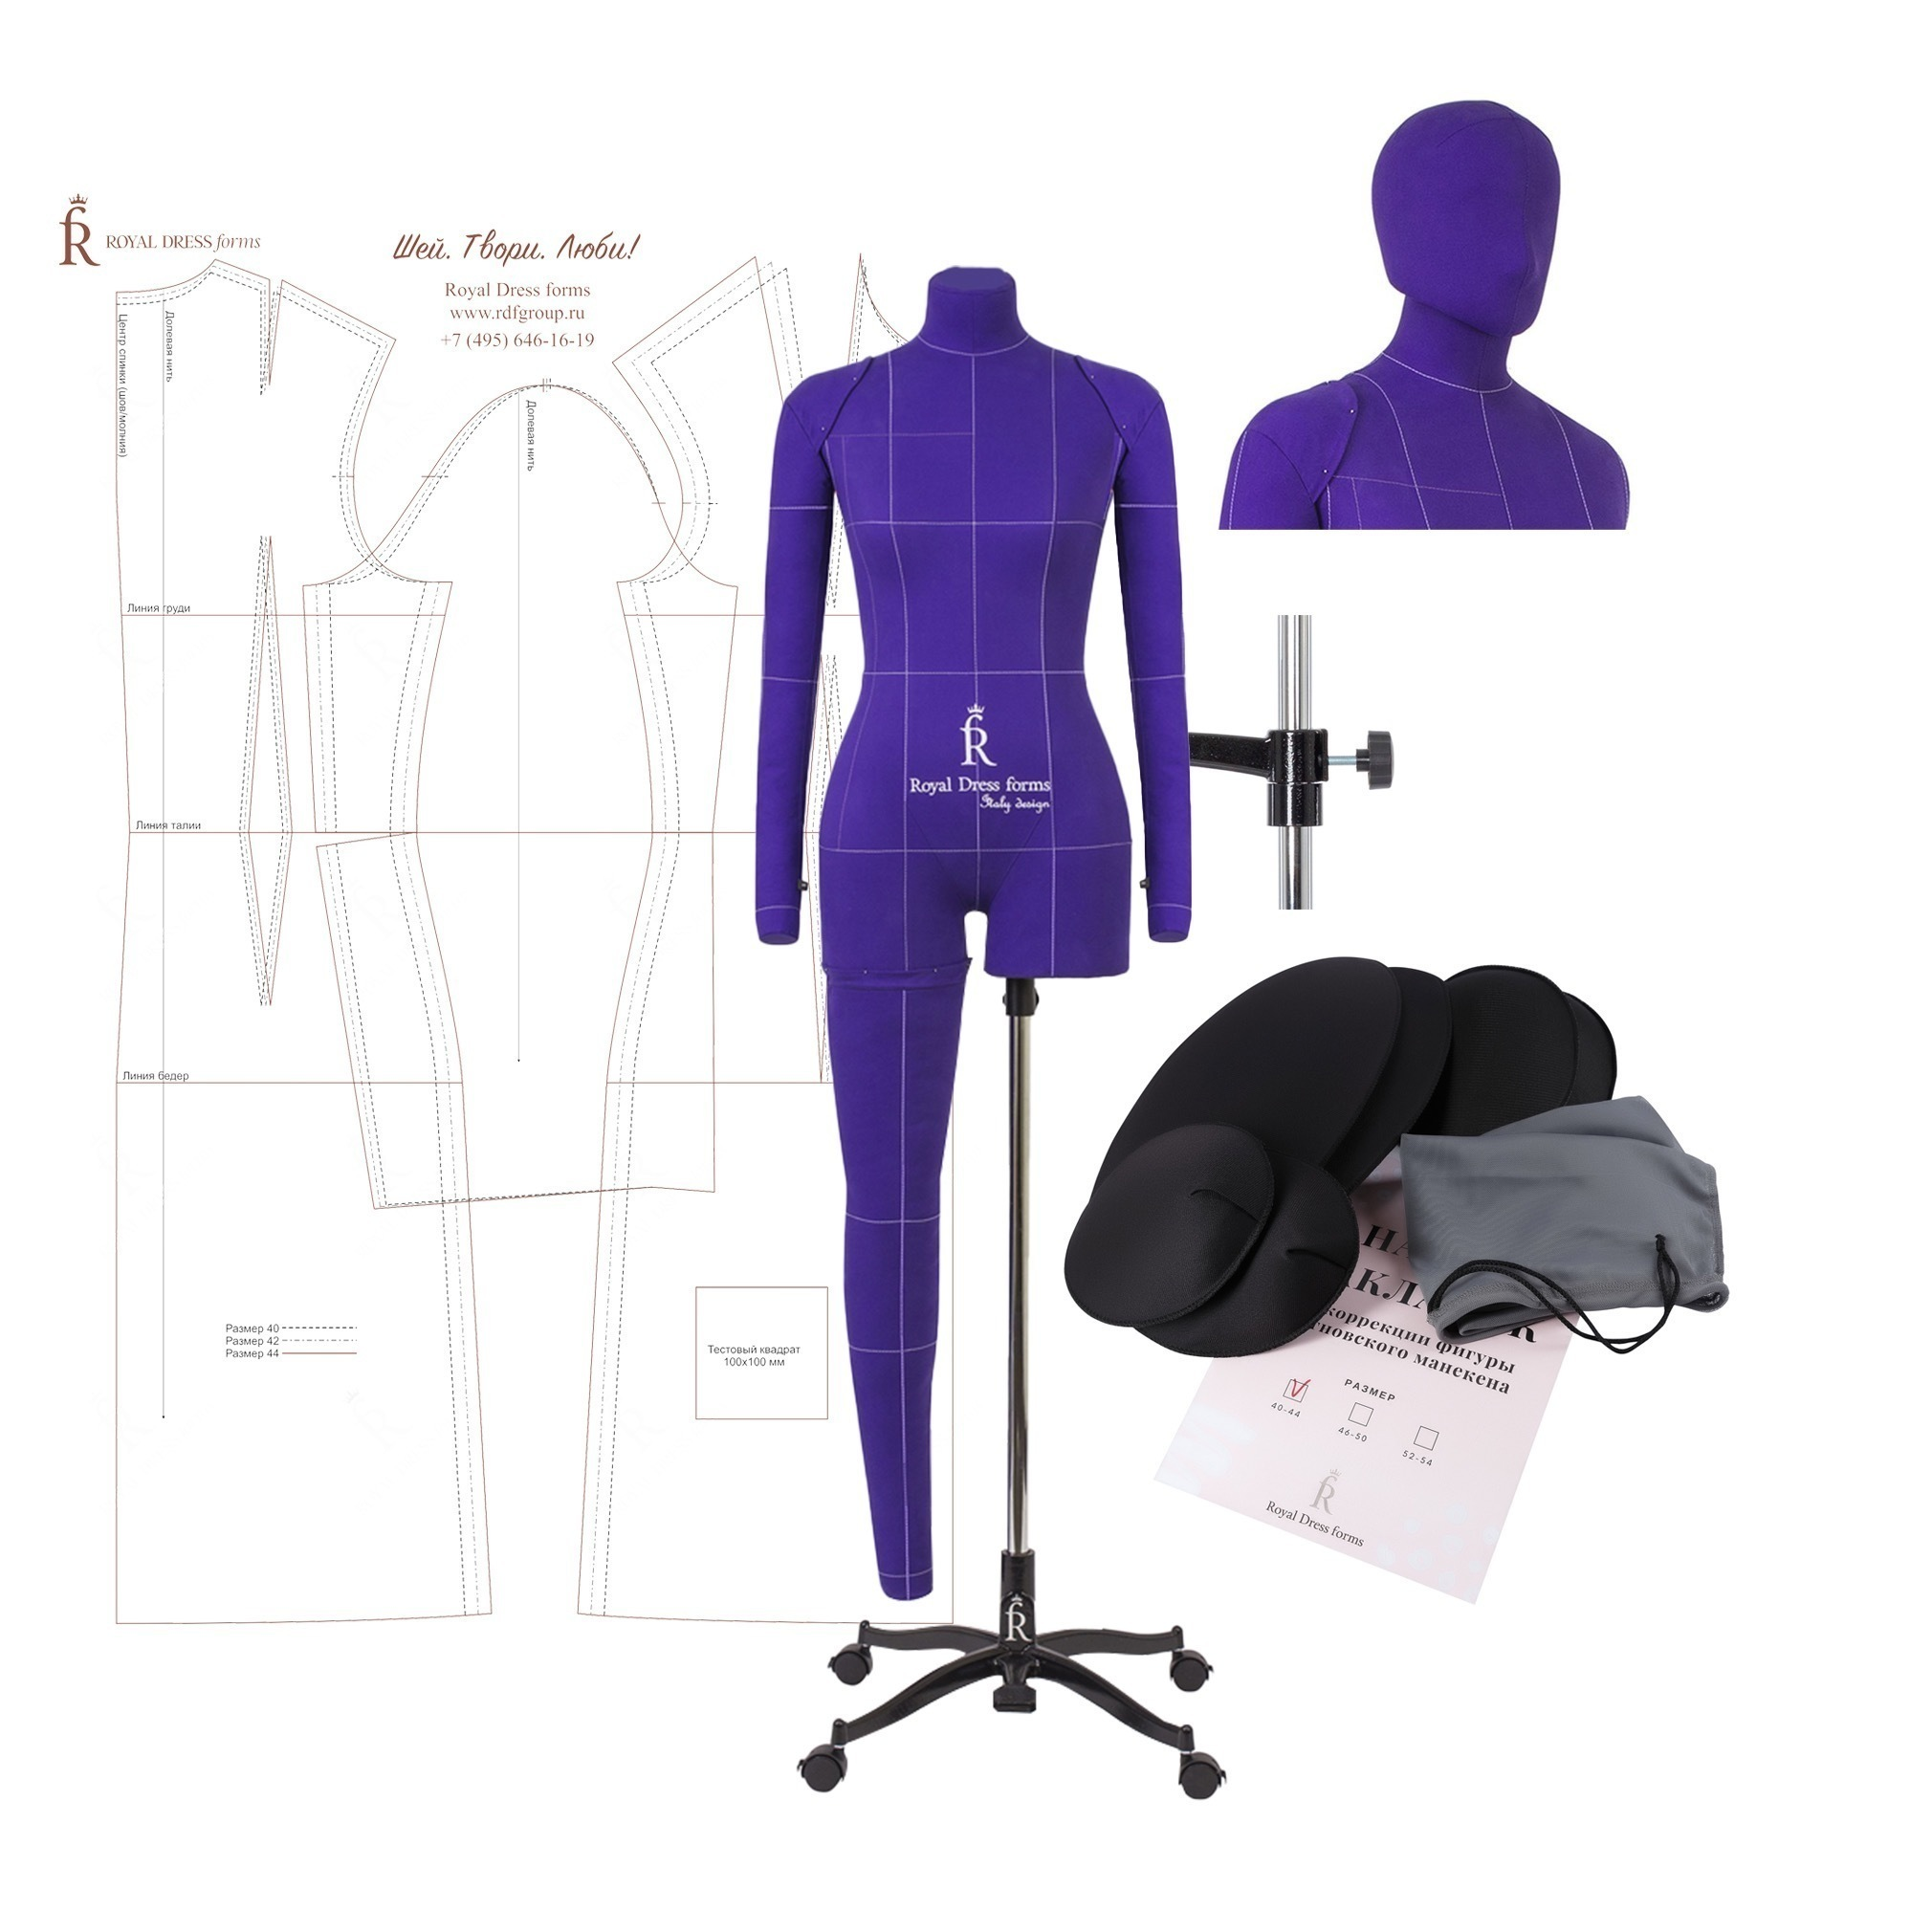 Манекен портновский Моника, комплект Арт, размер 52,  цвет фиолетовый, в комплекте накладки, руки, нога и голова